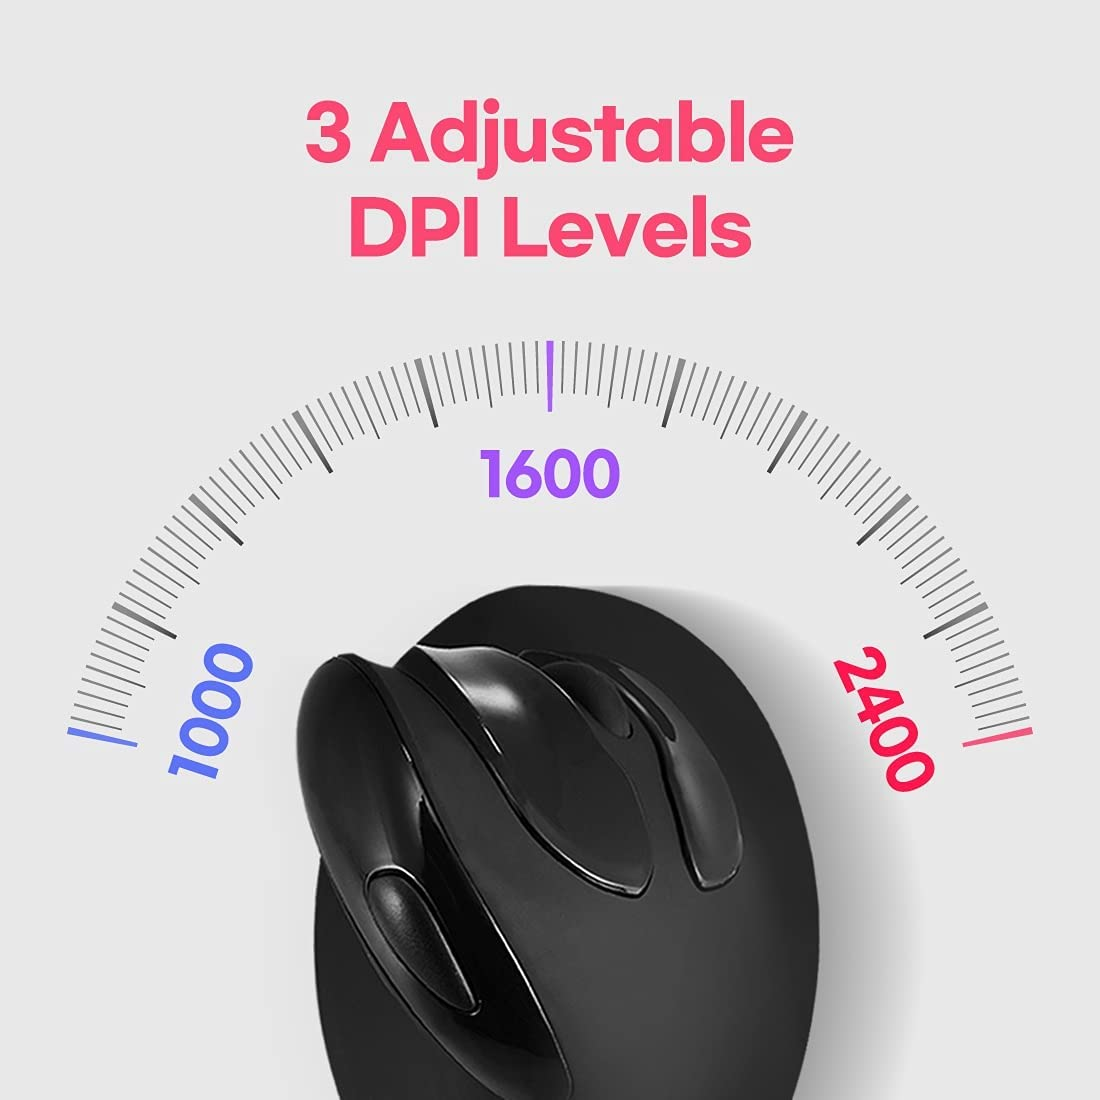 Actto Wireless Vertical Ergonomic Optical Mouse Optical Vertical Mice, 3 Adjustable DPI 1000/1600/2400, Pixart 3212 Sensor, Levels 6 Buttons, for Laptop, PC, Computer, Desktop, Notebook etc Black